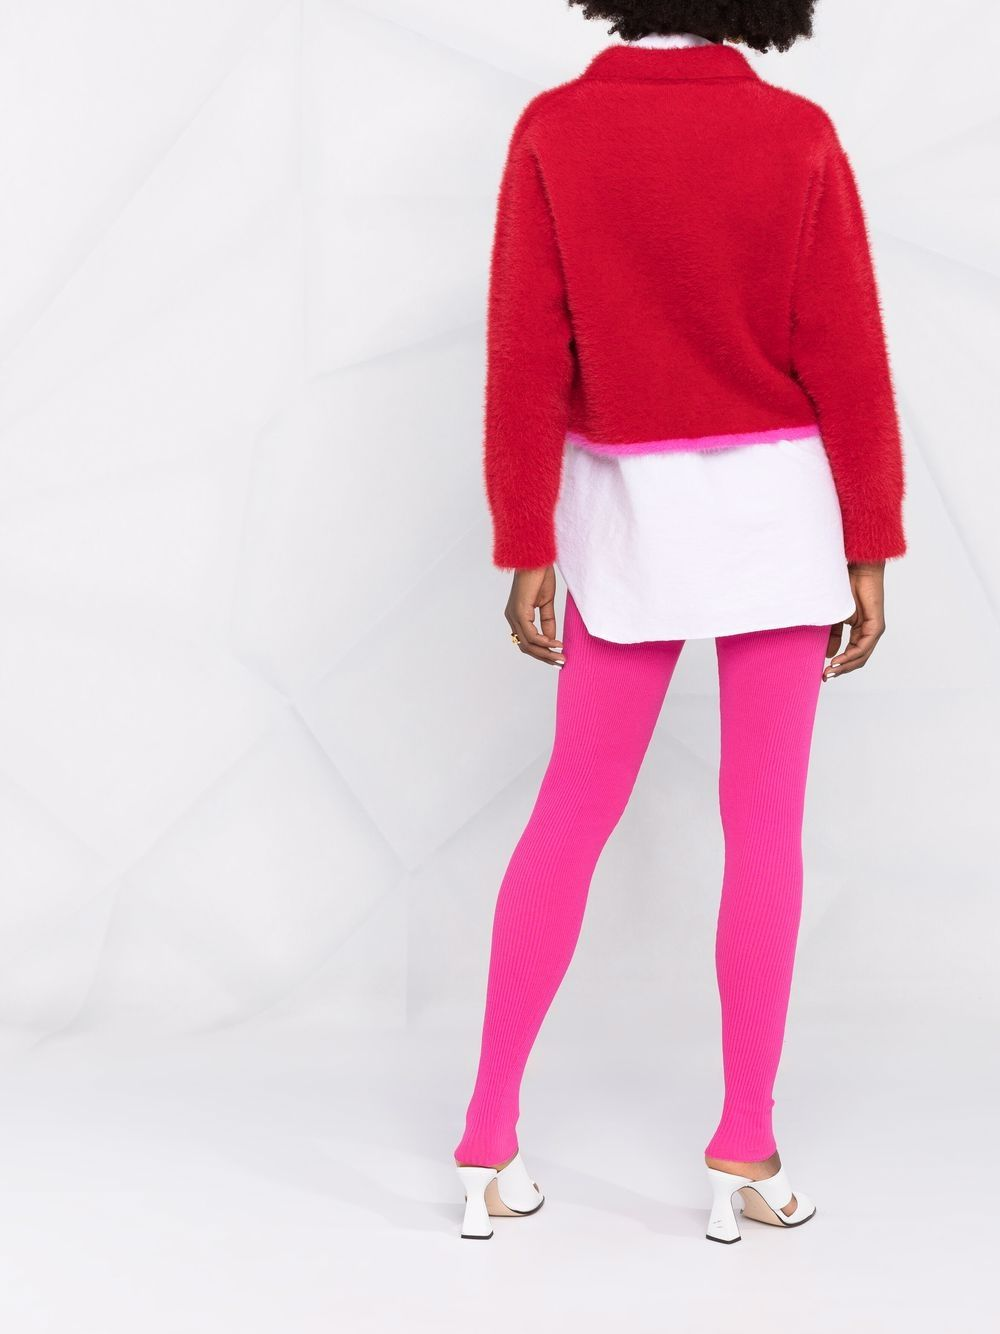 Pink Le Legging Arancia leggings featuring ribbed knit JACQUEMUS      213KN66-206450430